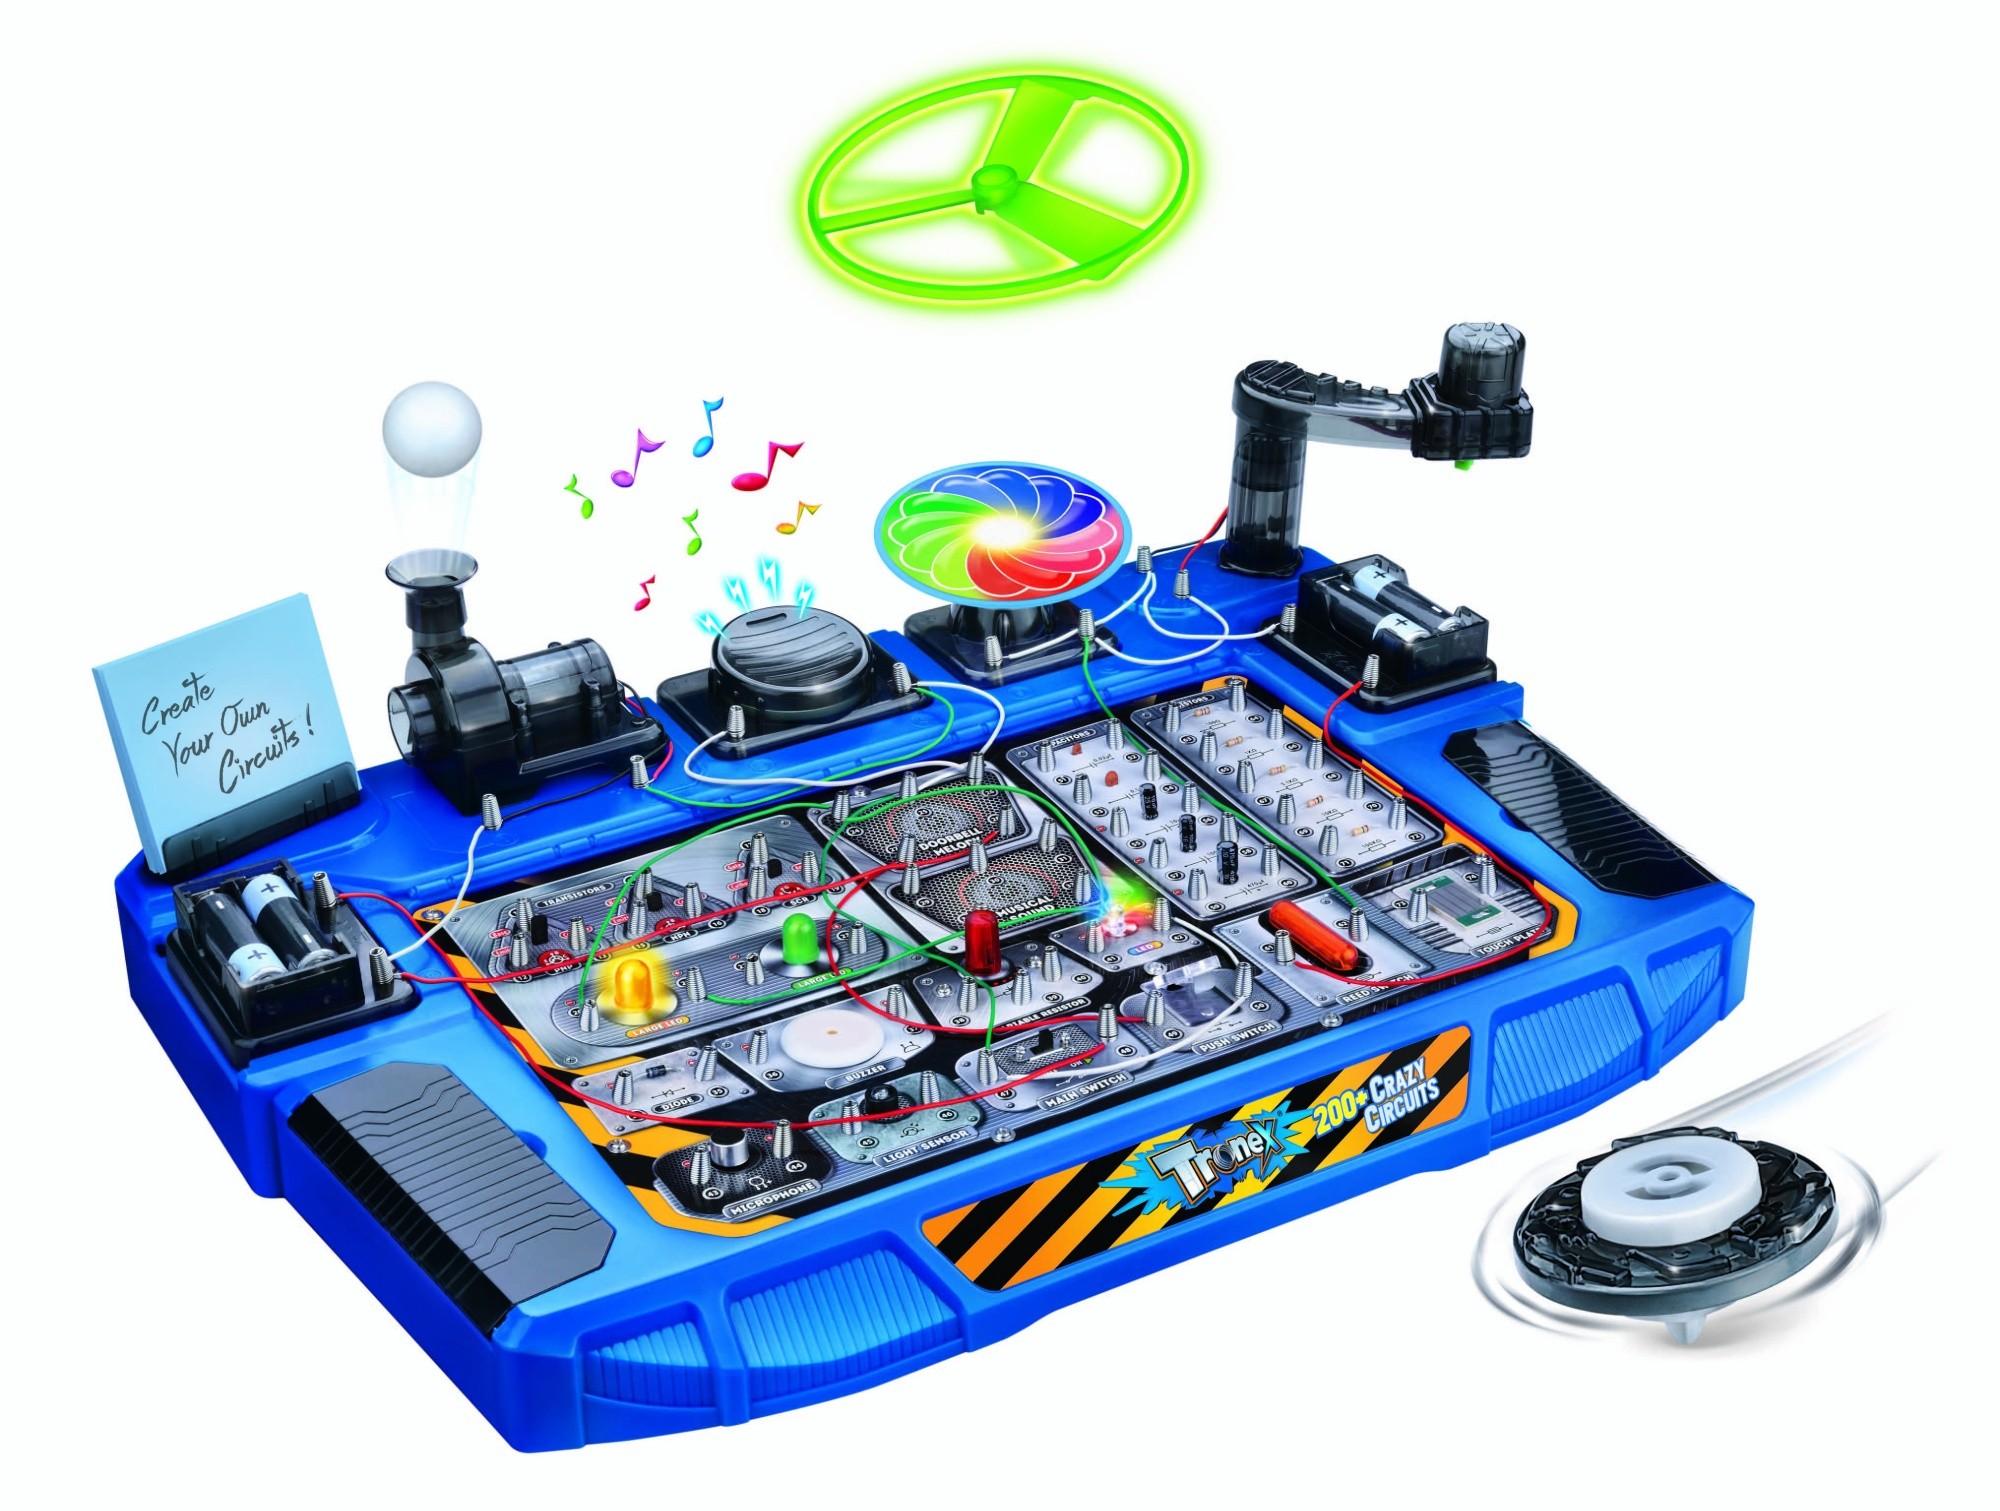 Unique Engineering Toys For Kids Images Children Ideas Amazoncom Elenco Circuit Maker 200 Sound Plus Electronics Discovery Tronex Crazy Circuits 31 Parts Electronic Kit